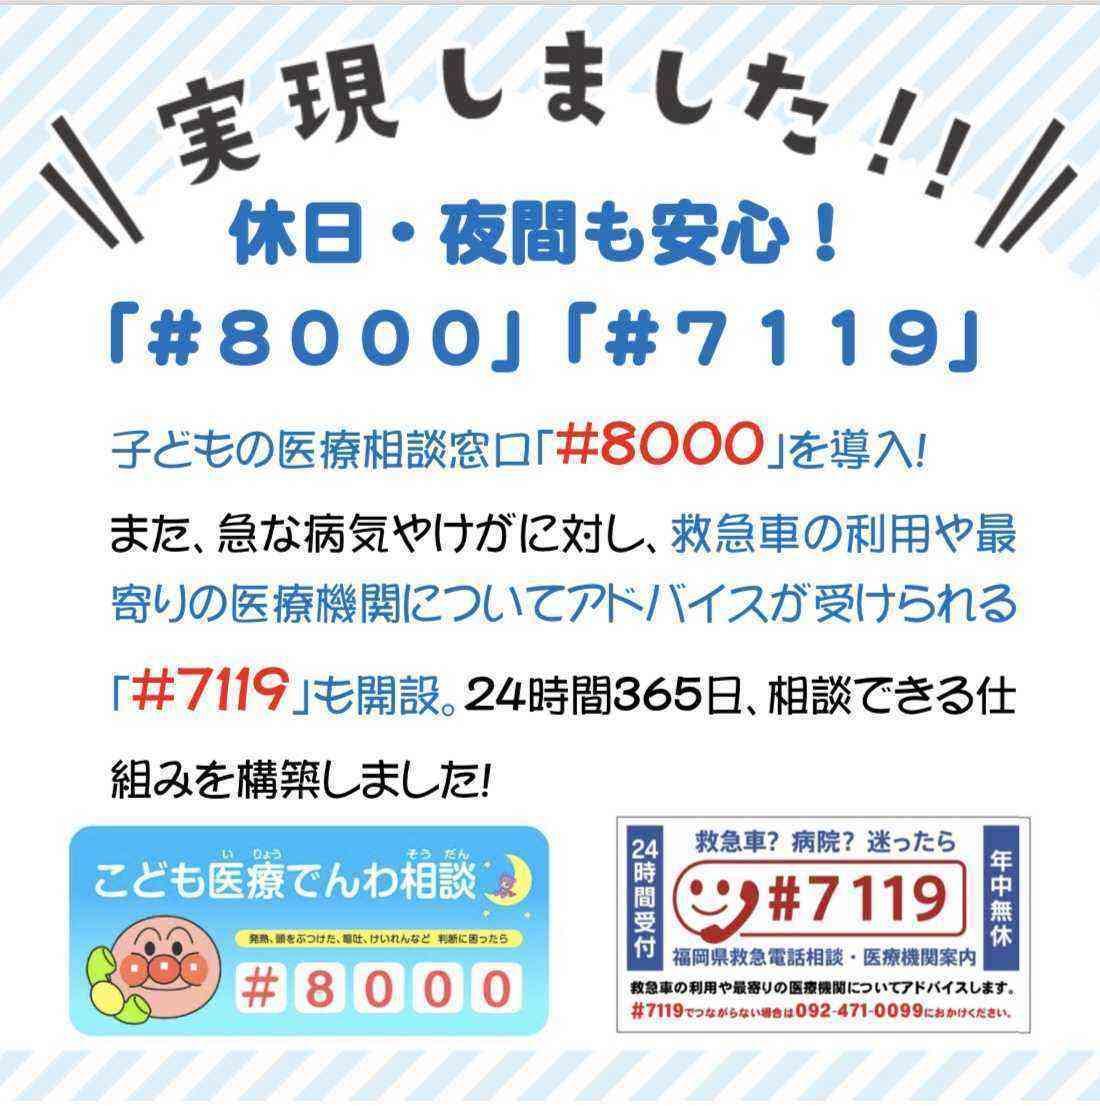 673459d75f 福岡県議会議員 浜崎たつや: 走れ!はまちゃん SNSコーナー